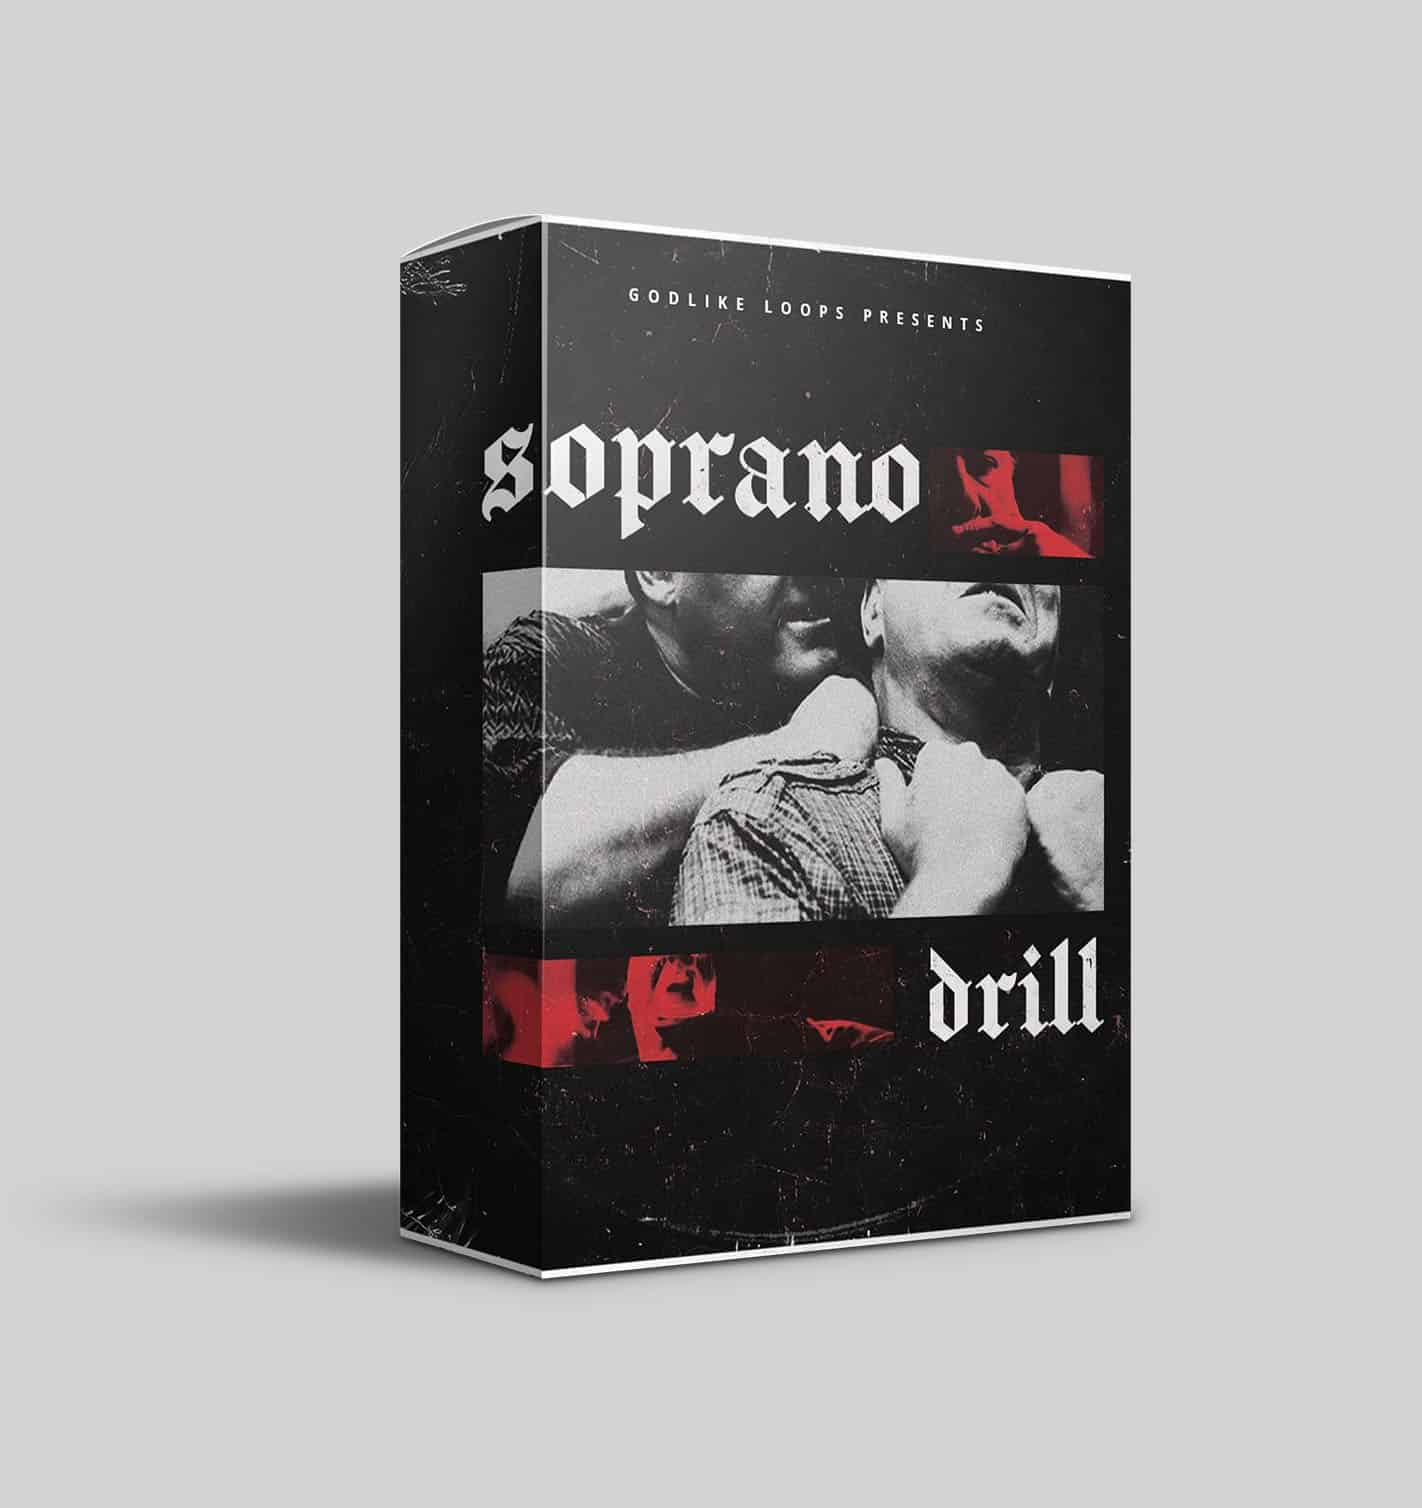 Godlike Loops - Soprano Drill